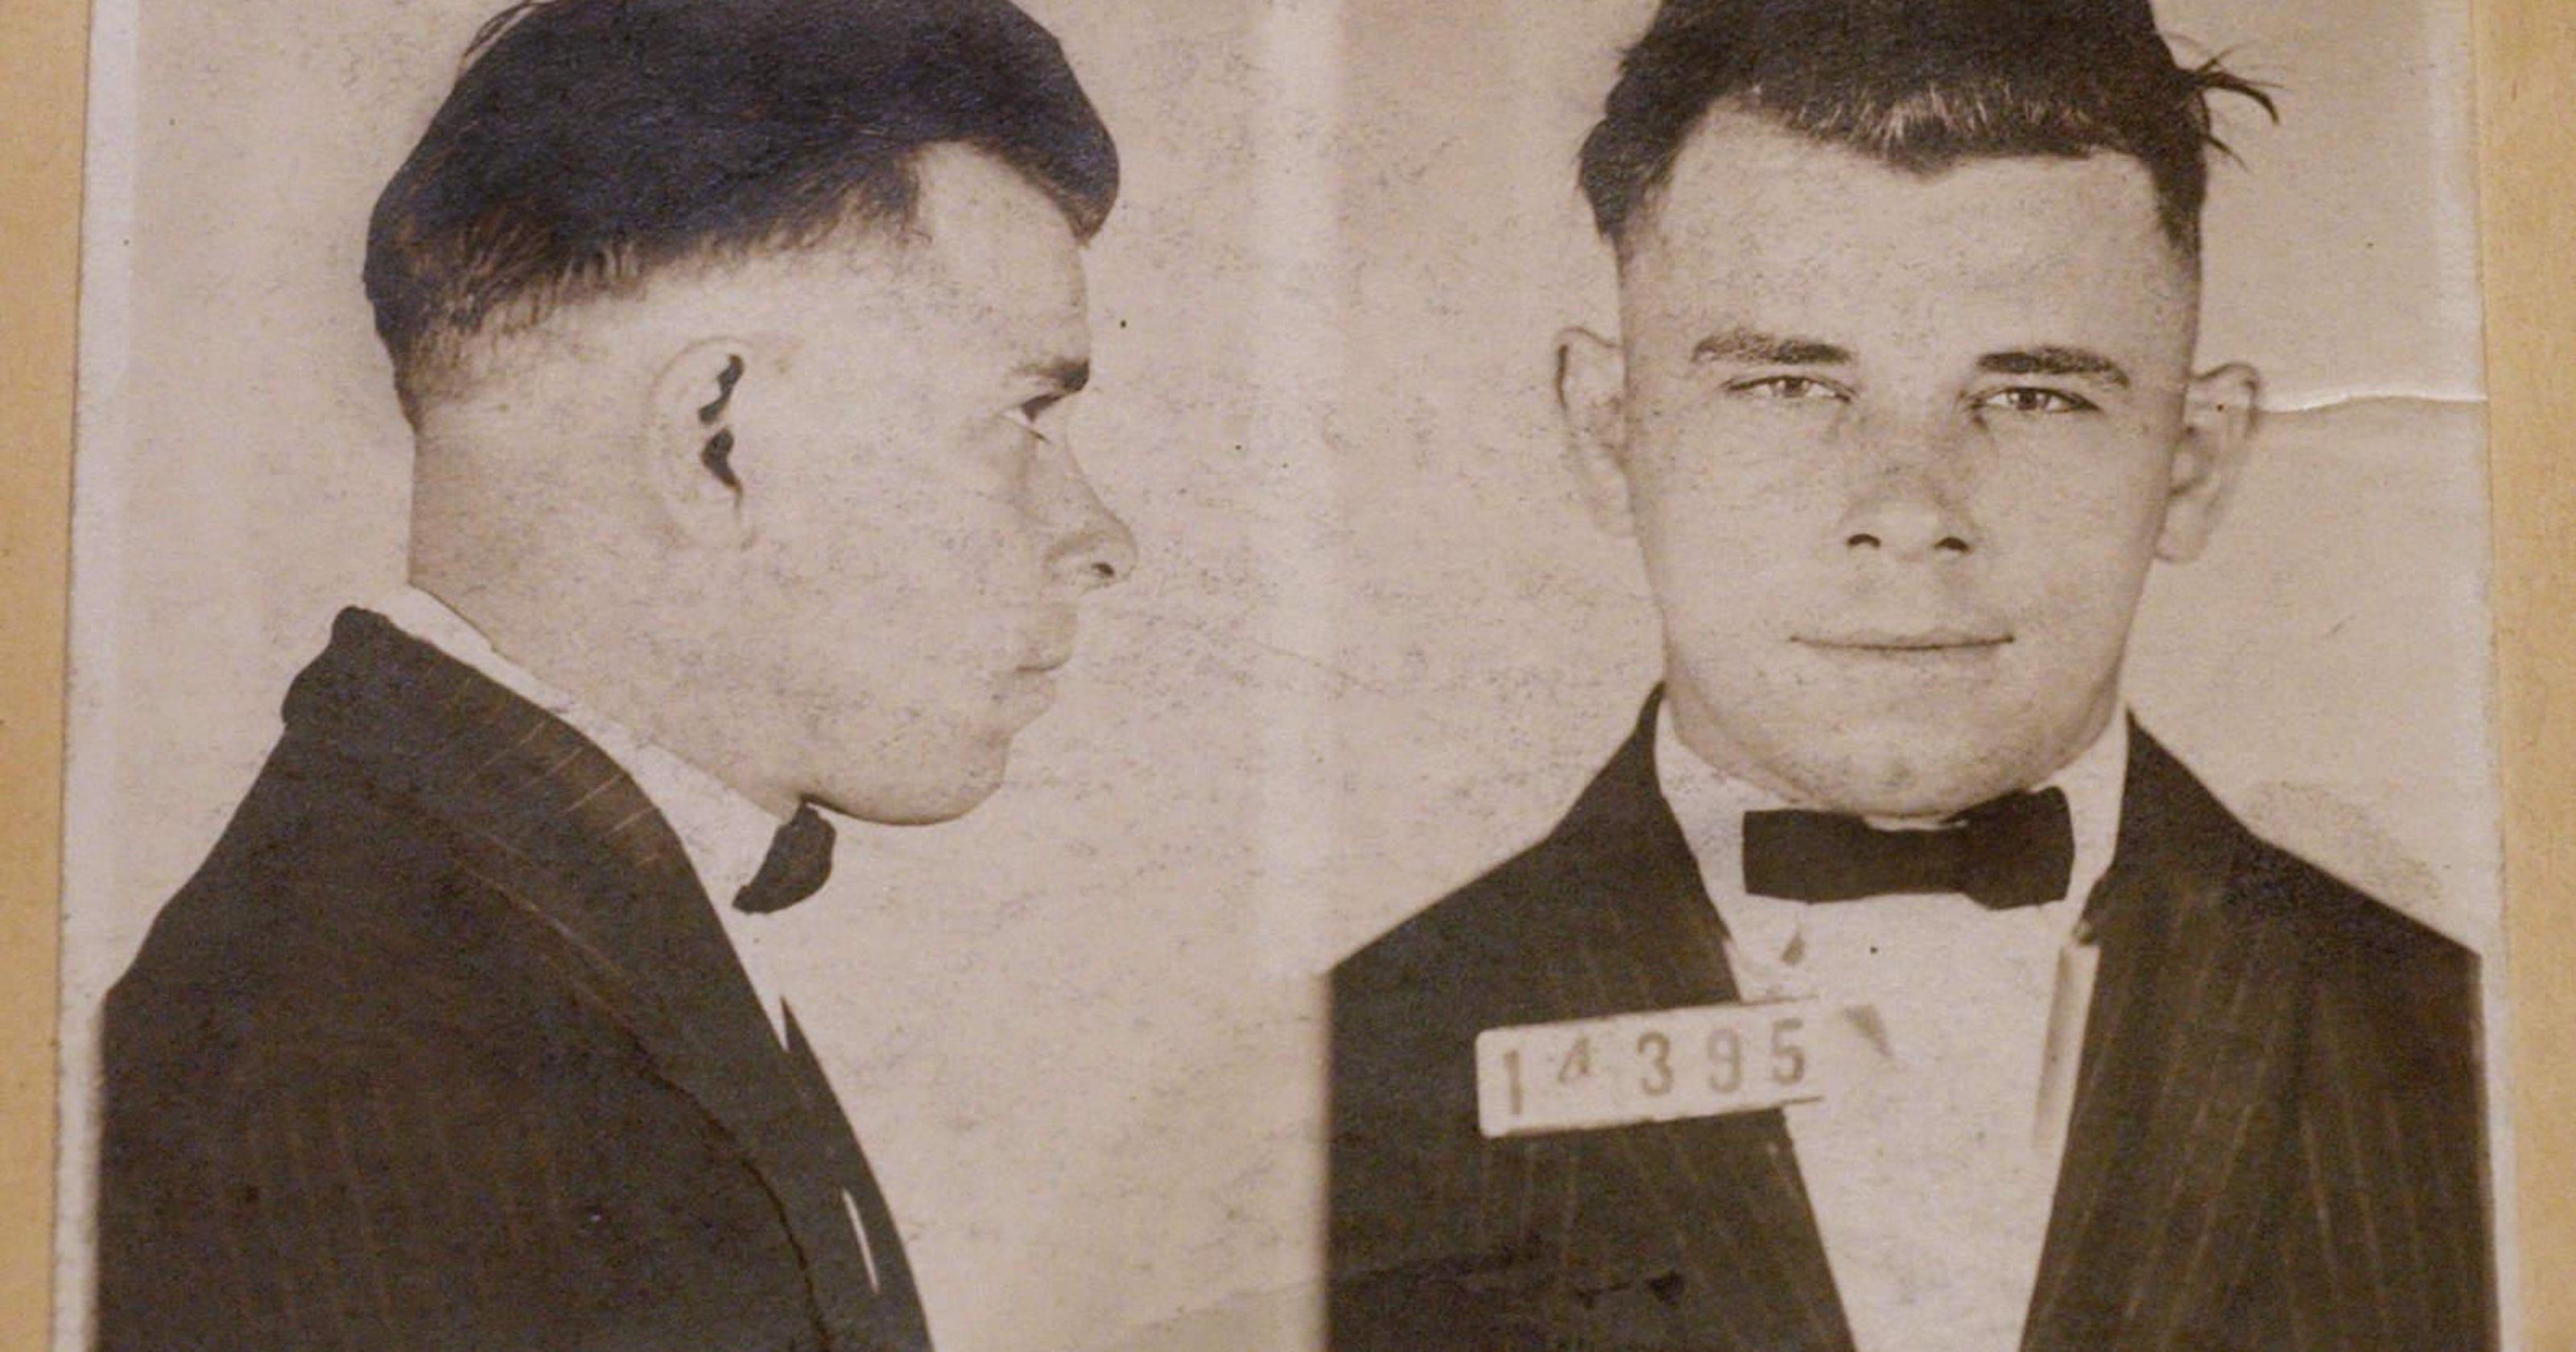 A Missing Brain The Bizarre Burial Of John Dillinger